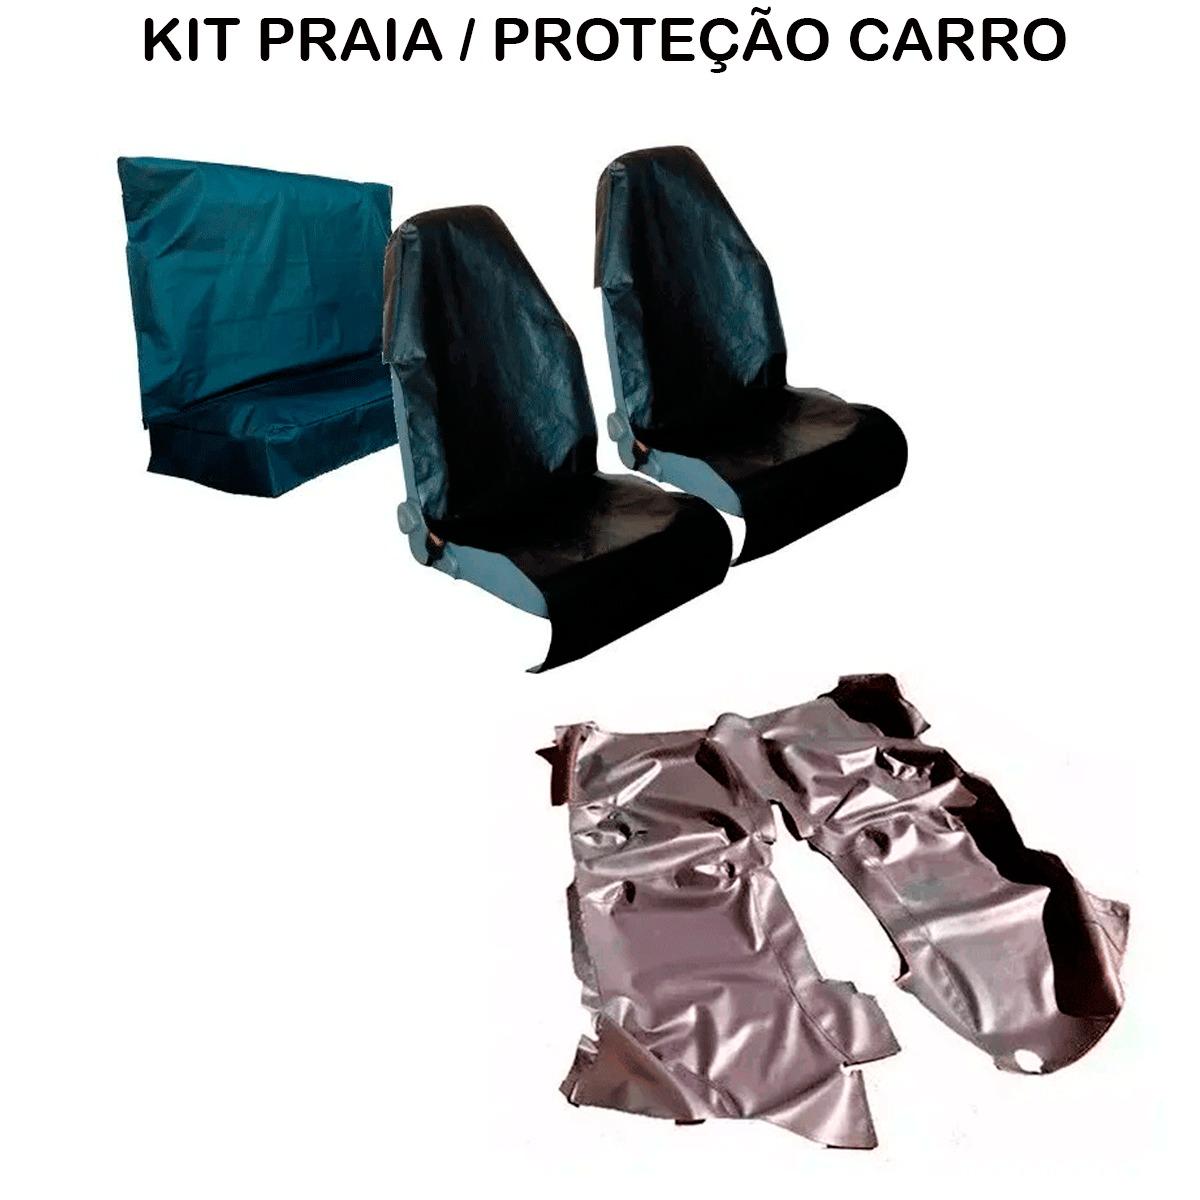 Tapete Em Vinil Fiat Uno 2004 a 2015 + Capa Banco Protecao Banco Areia Suor Academia